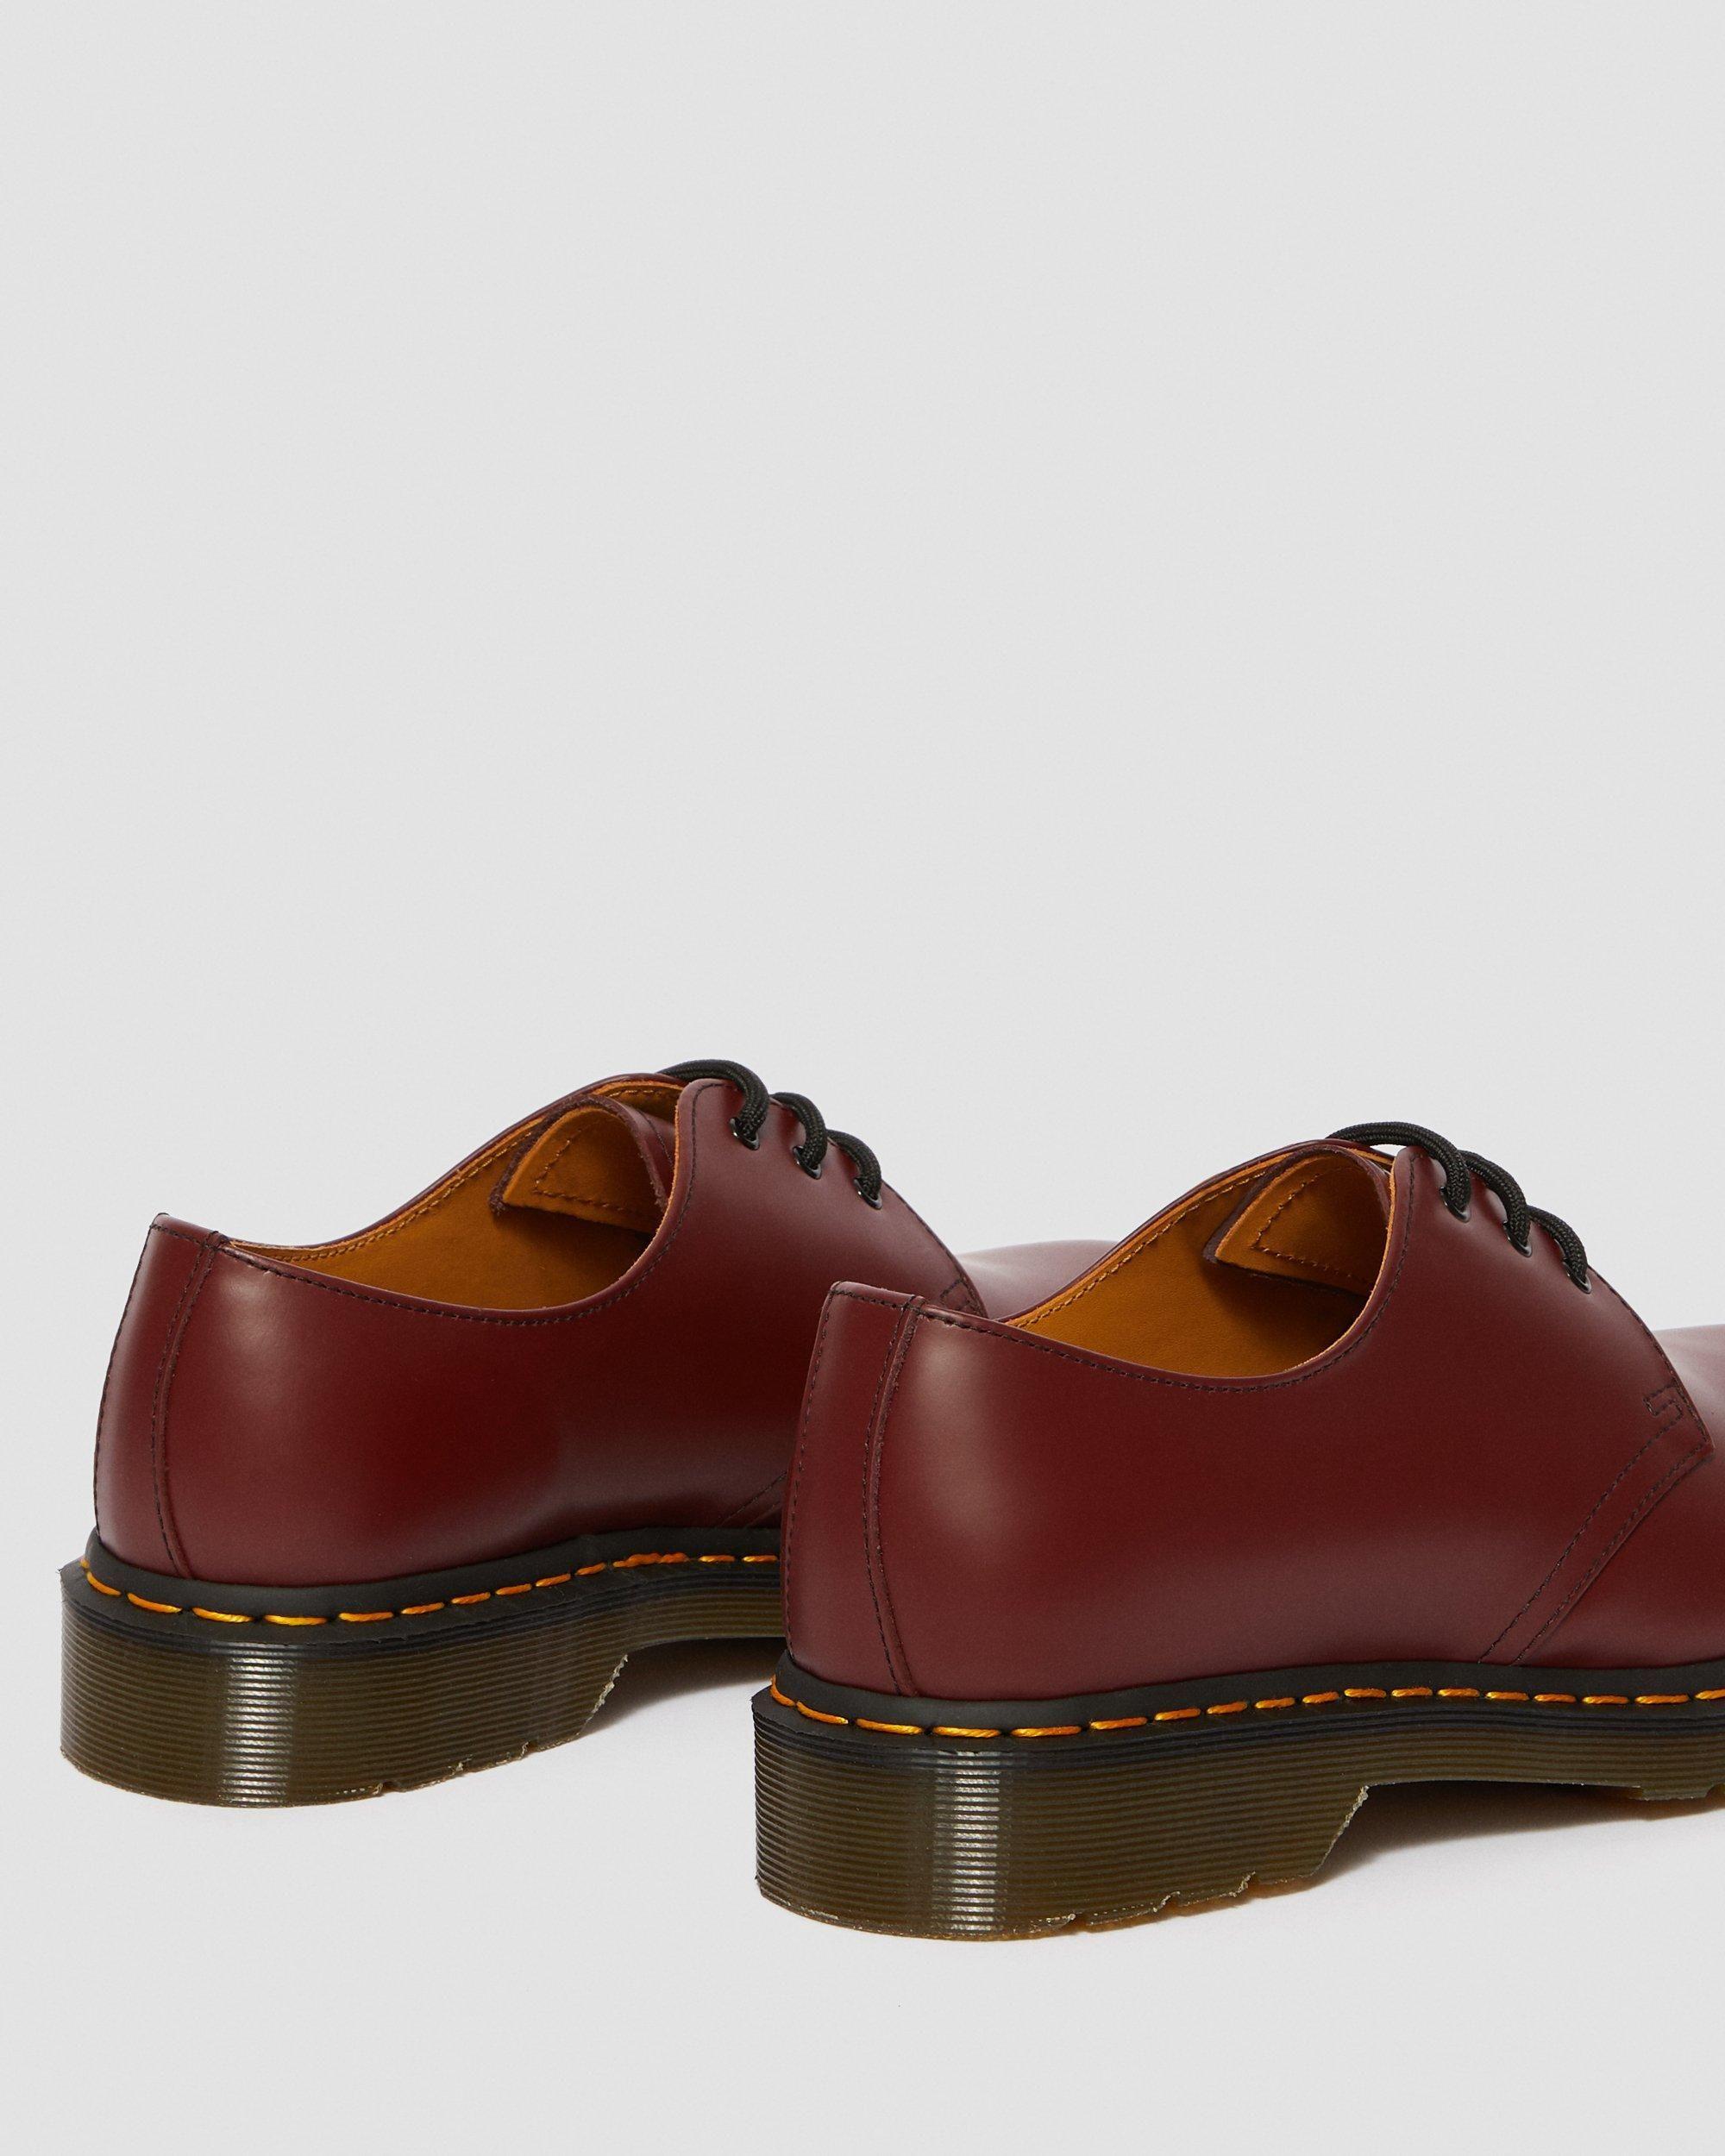 Dr Martens | Women's Footwear | Footasylum